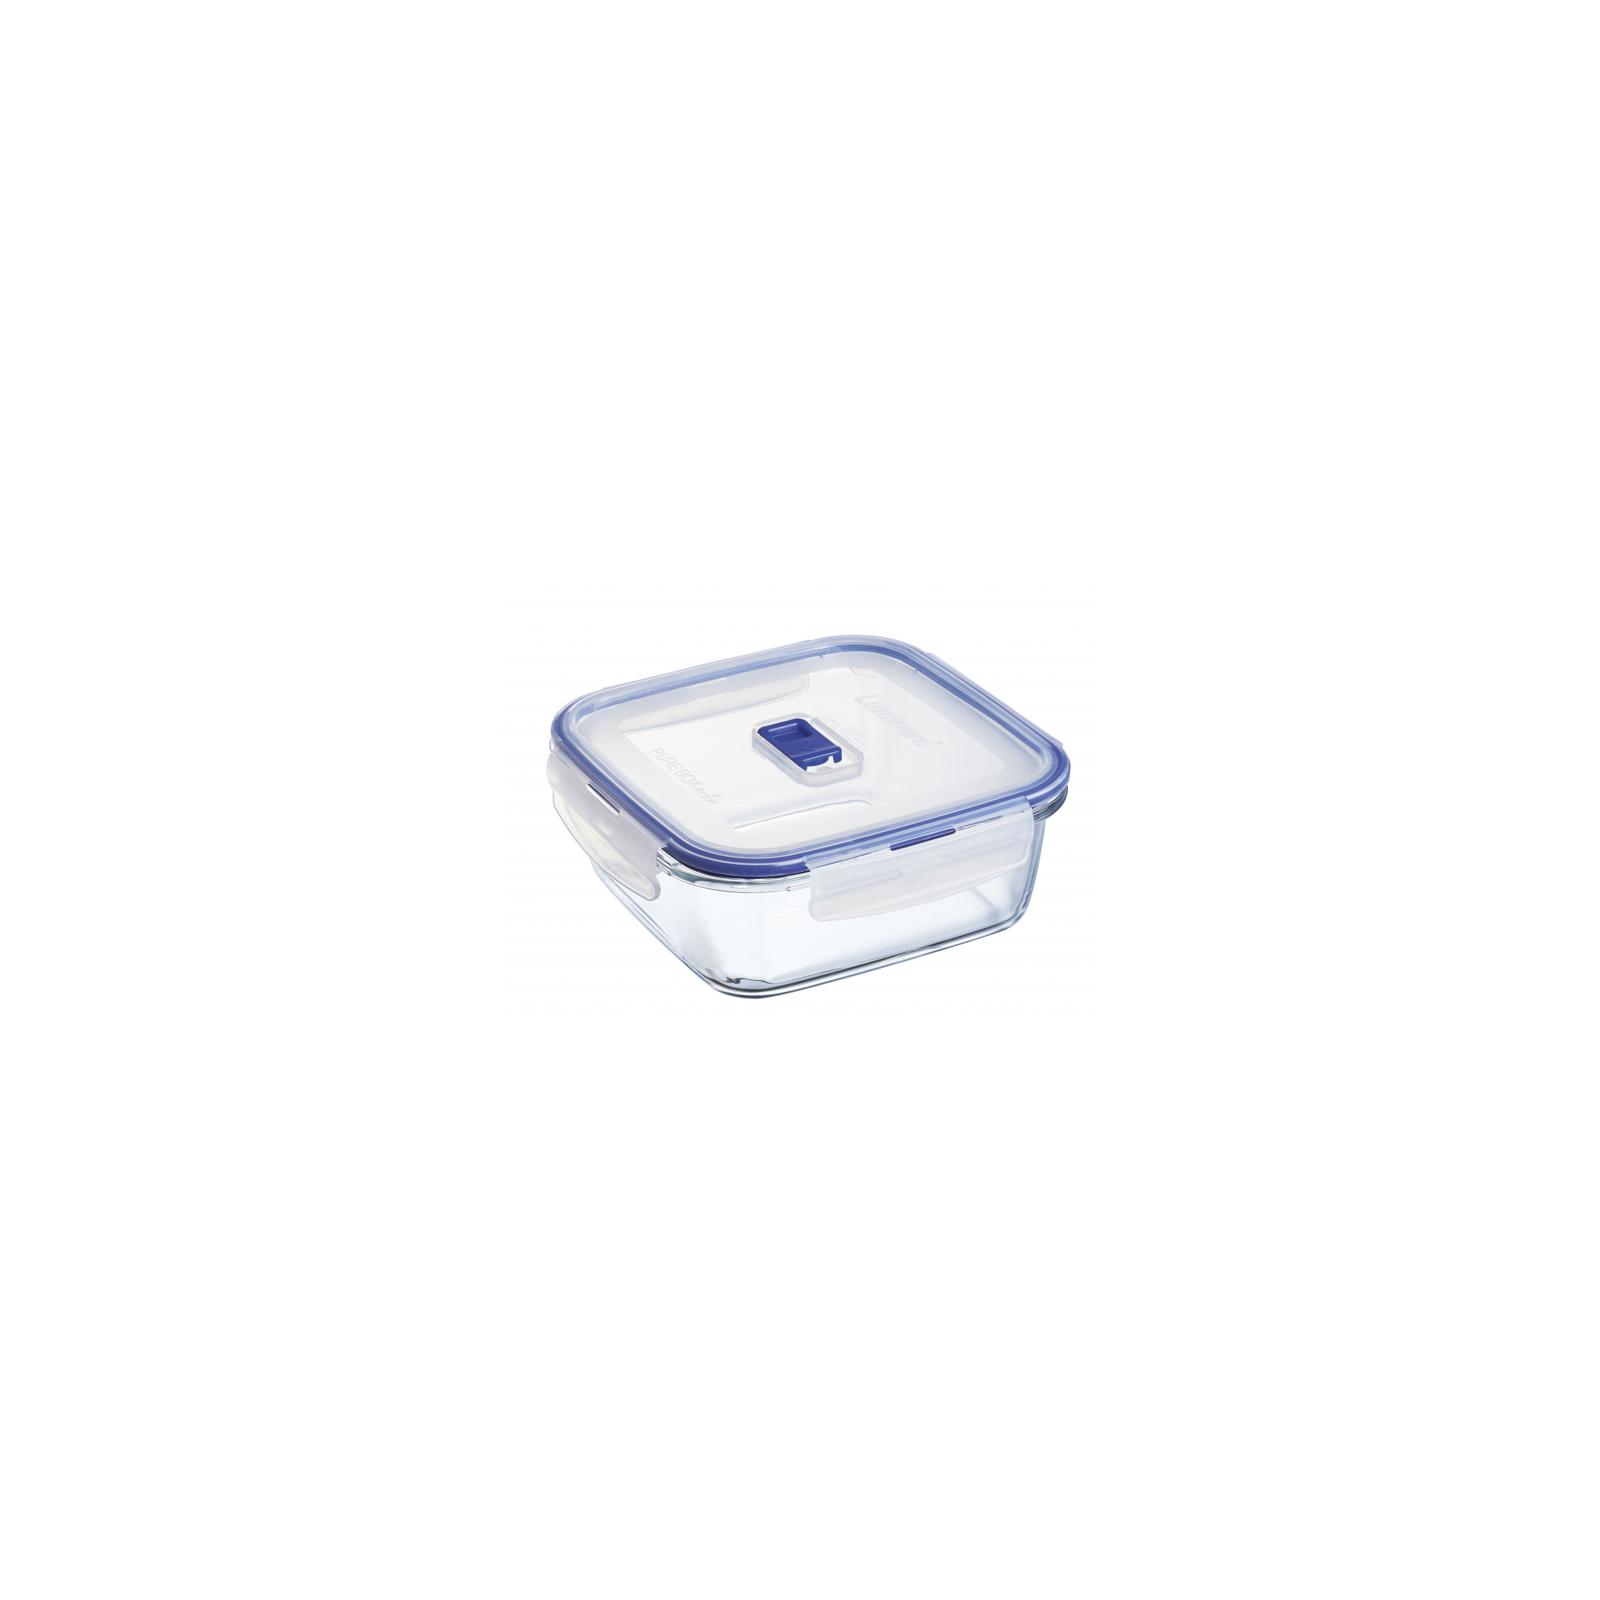 Пищевой контейнер Luminarc Pure Box Active набор 3шт квадр. 380мл/770мл/1220мл (P5276) изображение 4